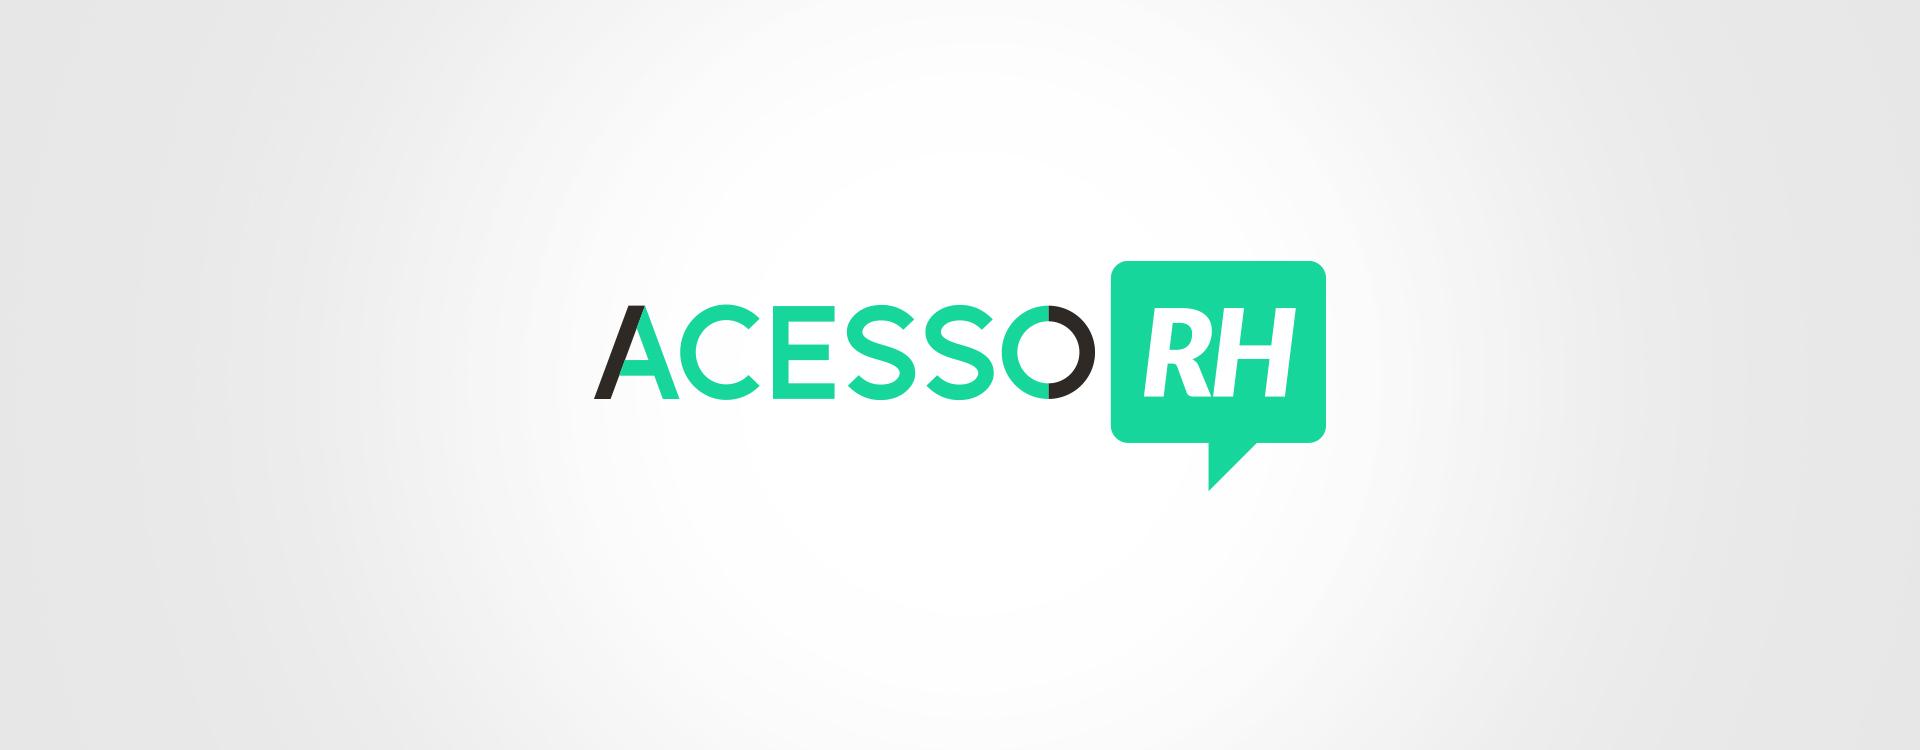 ACESSO RH